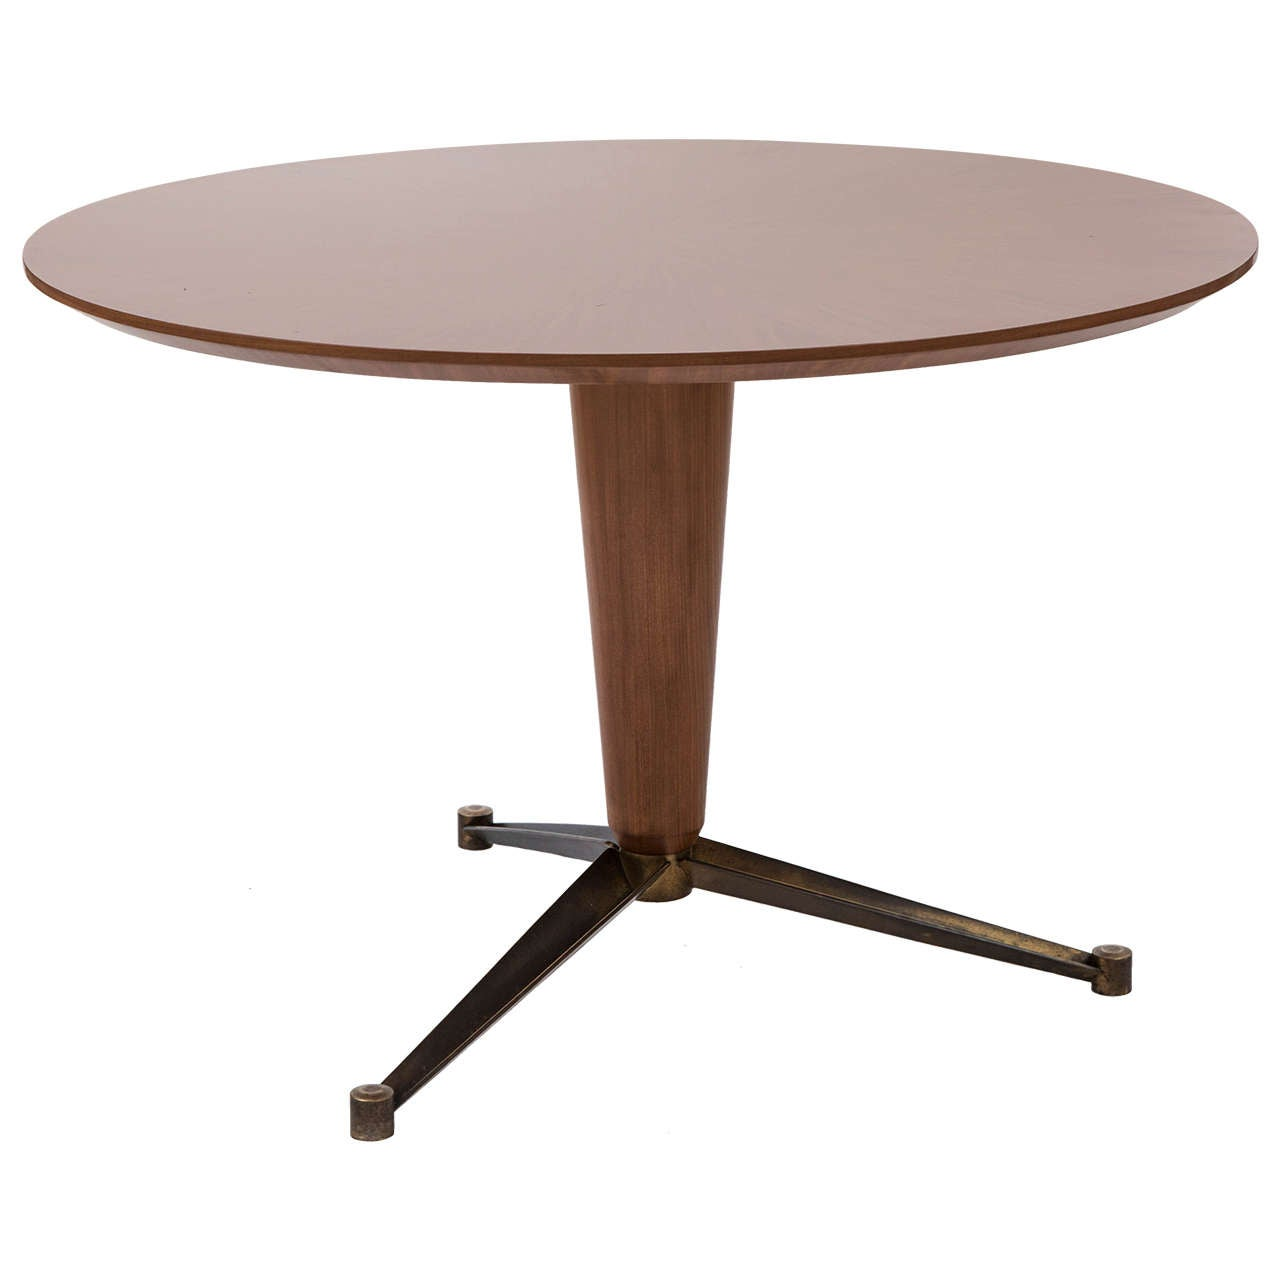 Paolo Buffa attributed mahogany circular centre table, Italy circa 1950